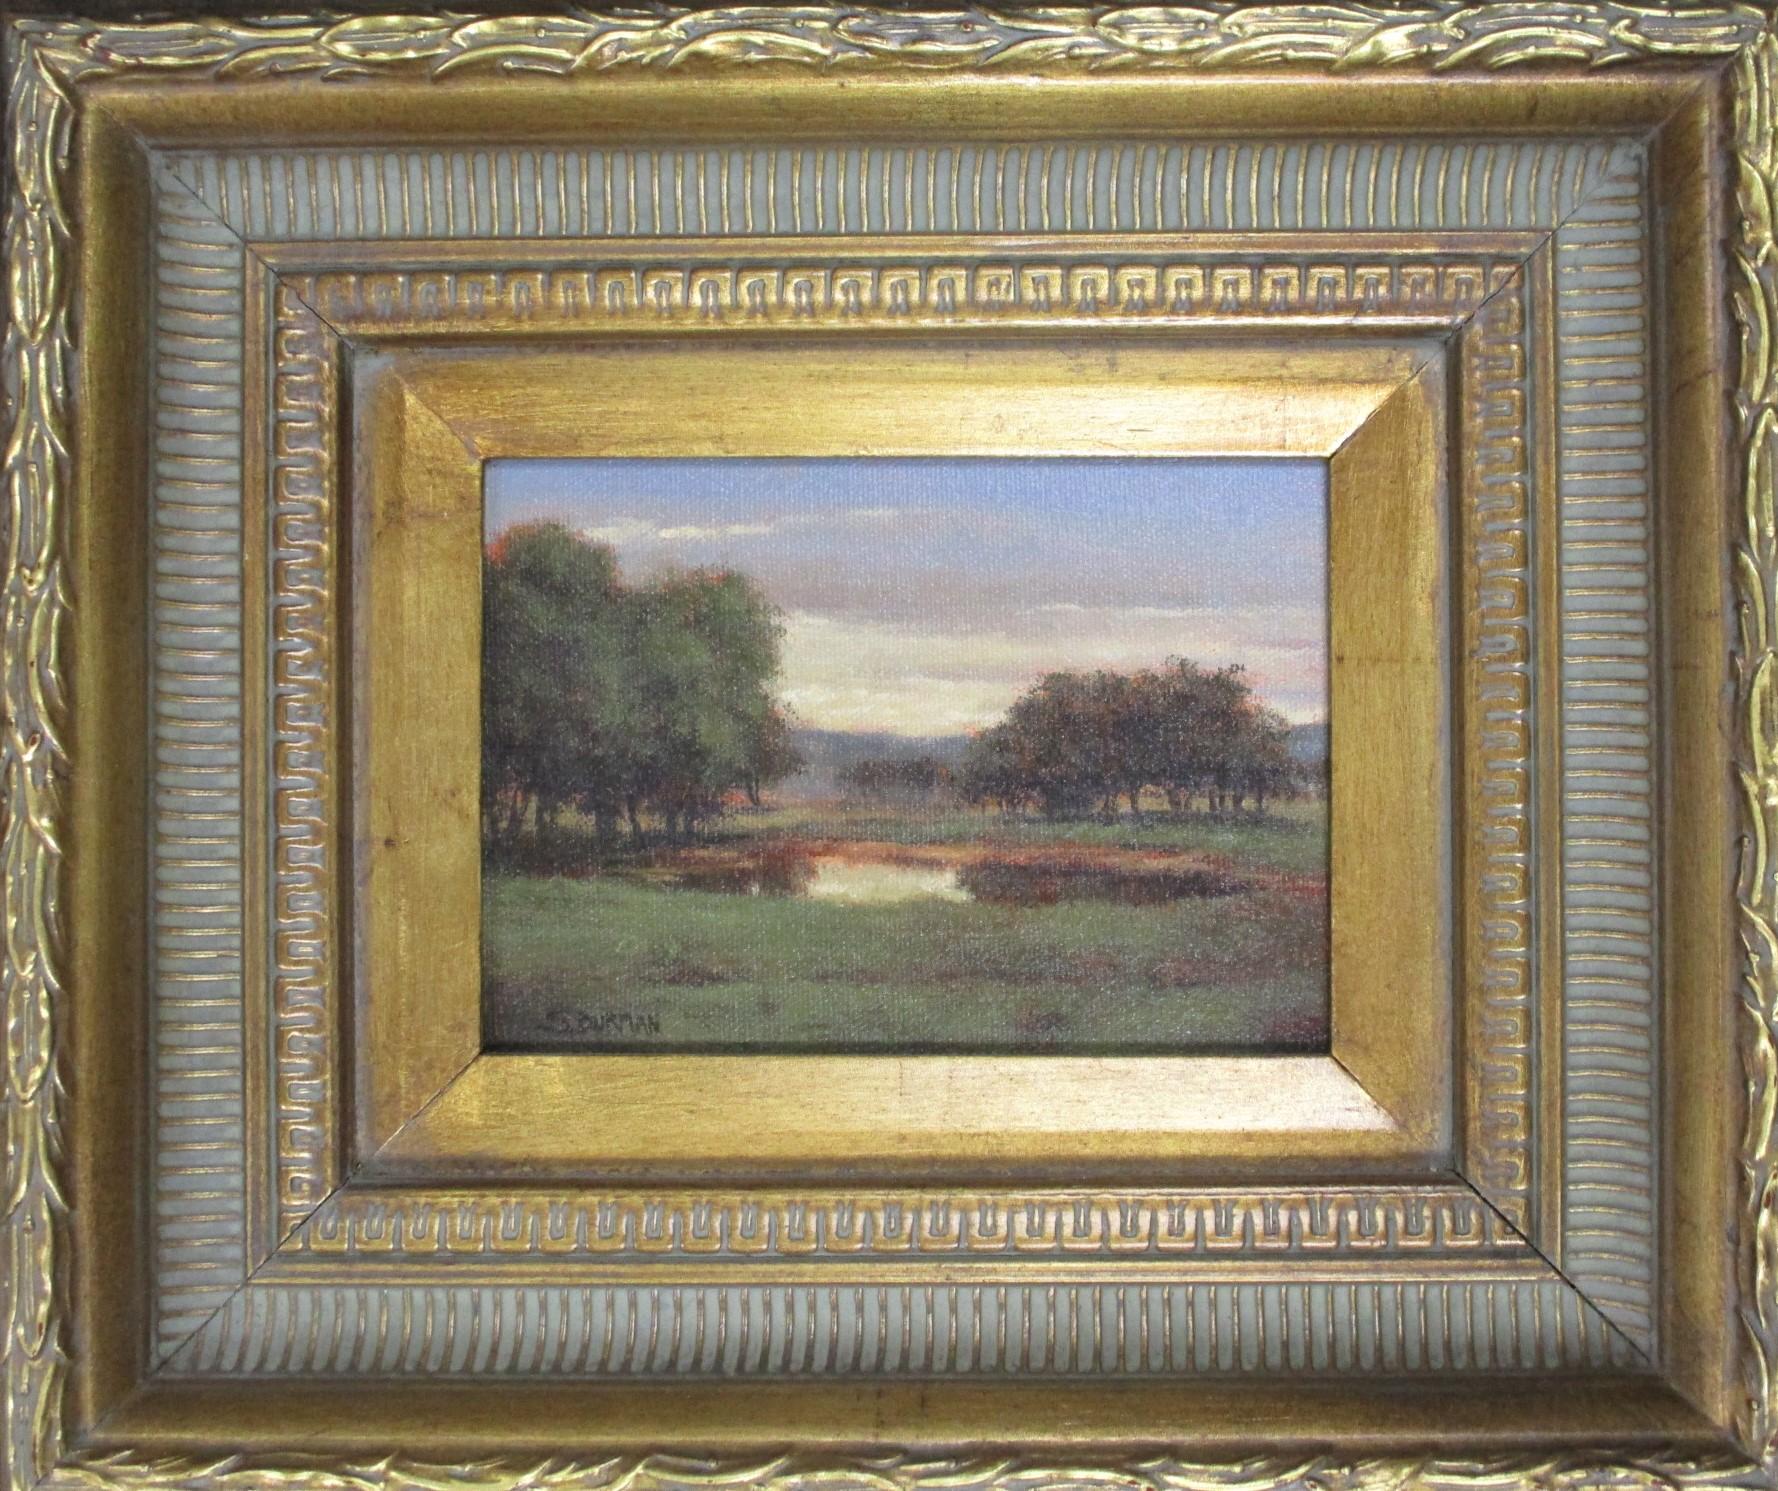 Unknown landscape by  Sandee Nycz Burman - Masterpiece Online